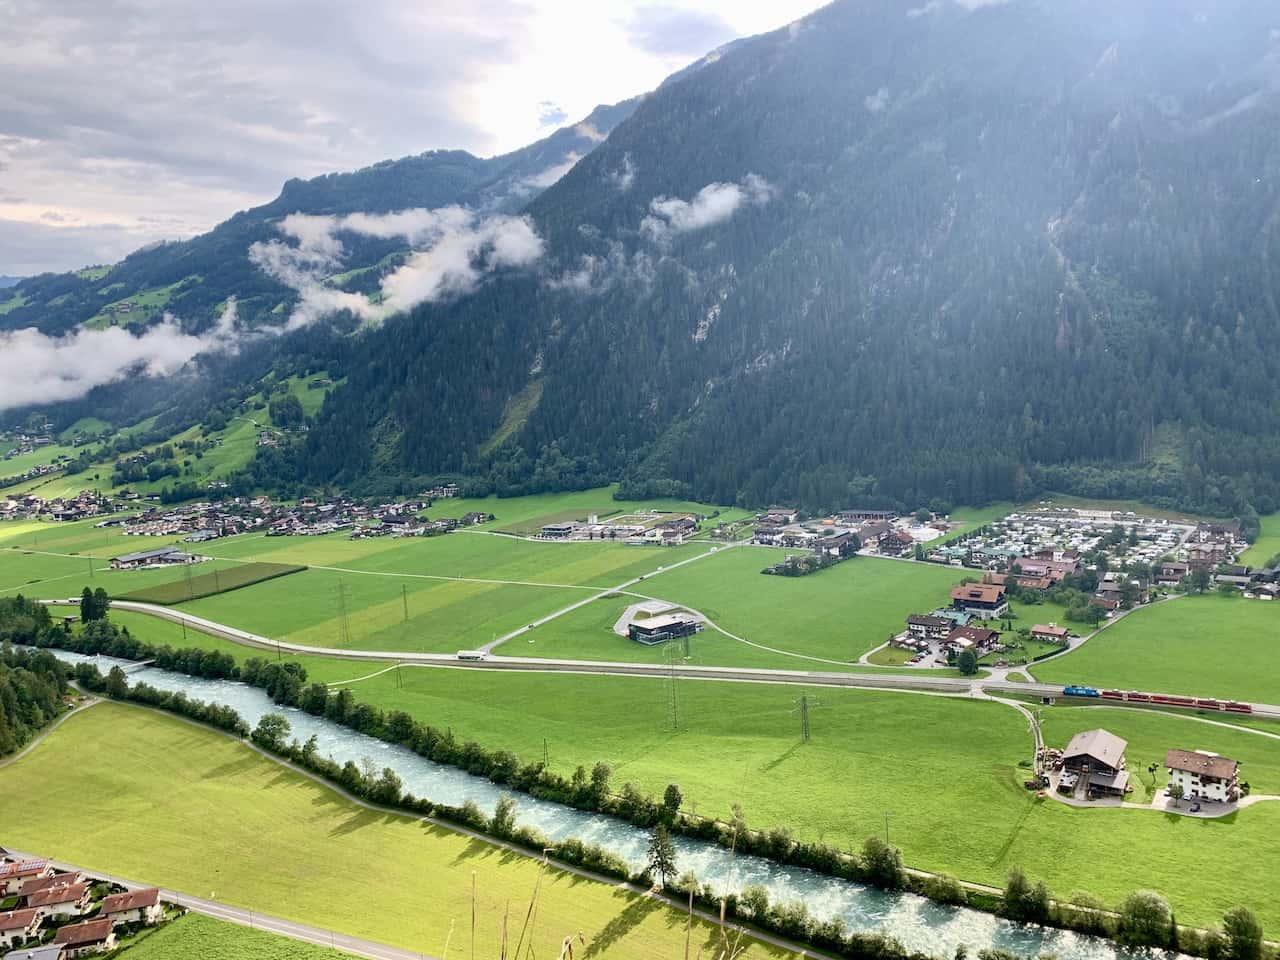 Mayrhofen Greenery